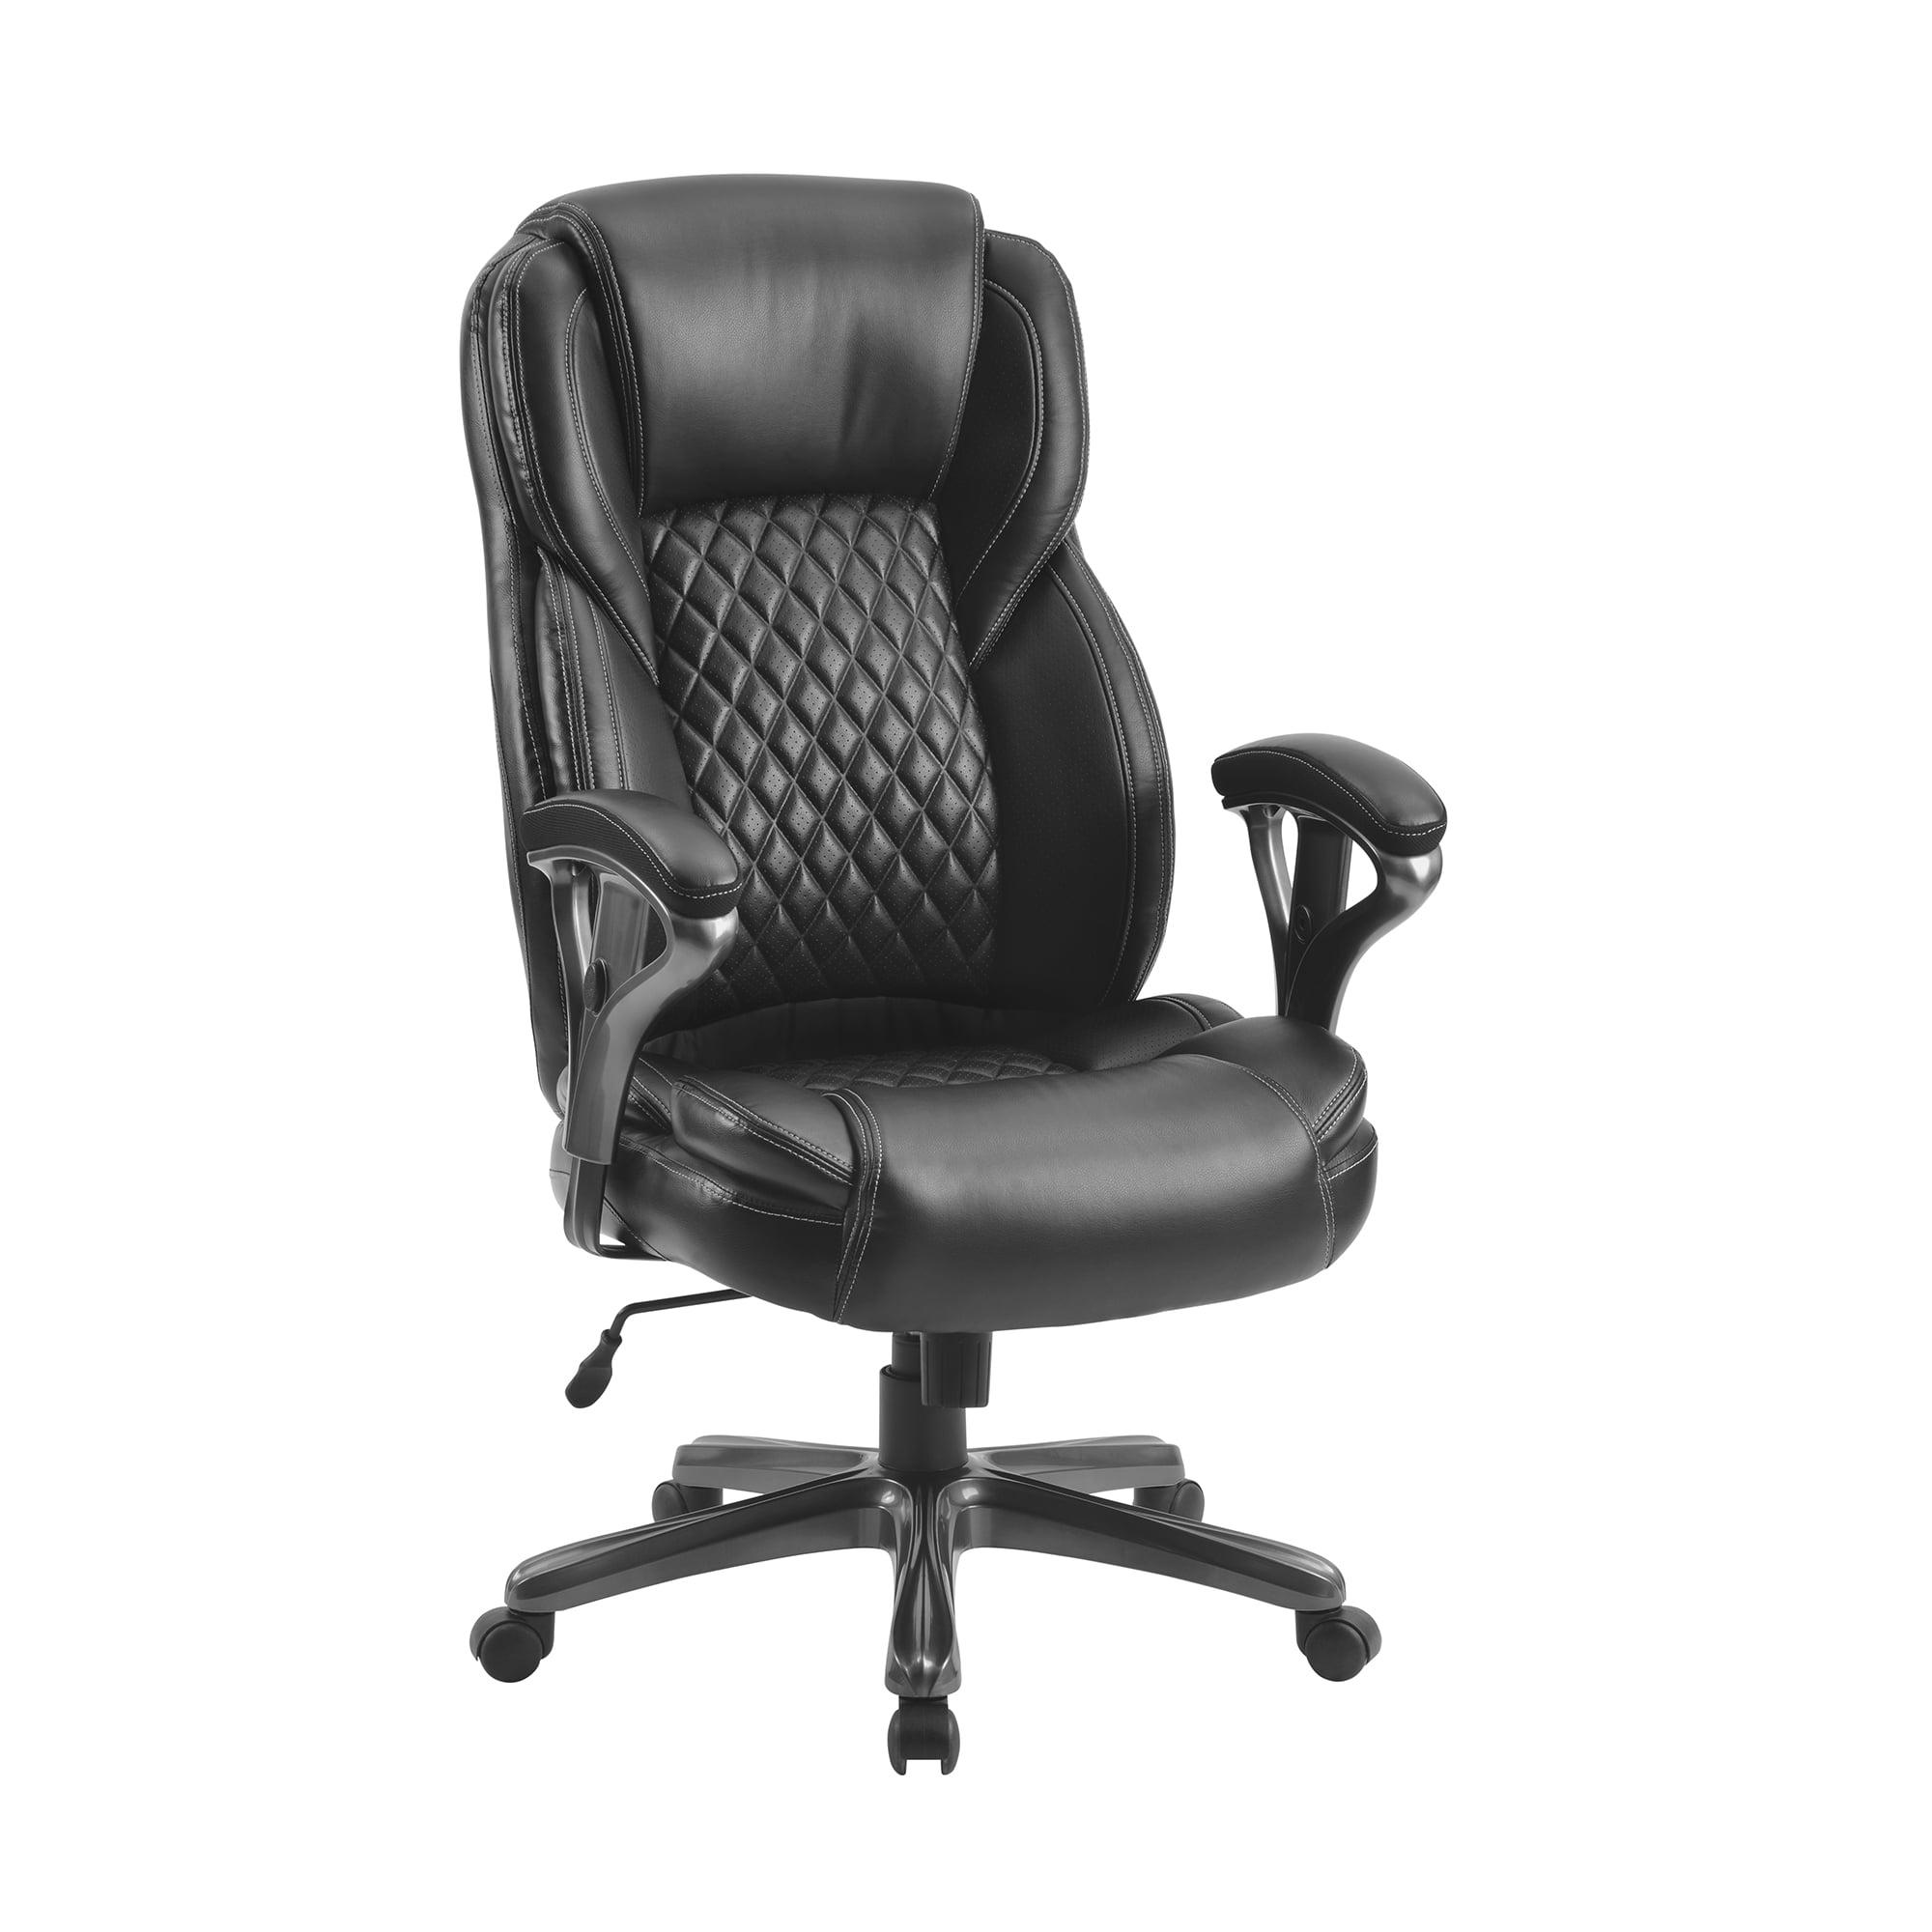 Home Office Big And Tall Pu Leather Office Chair Ergonomic Computer Chair High Back Pu Executive Chair Black Walmart Com Walmart Com